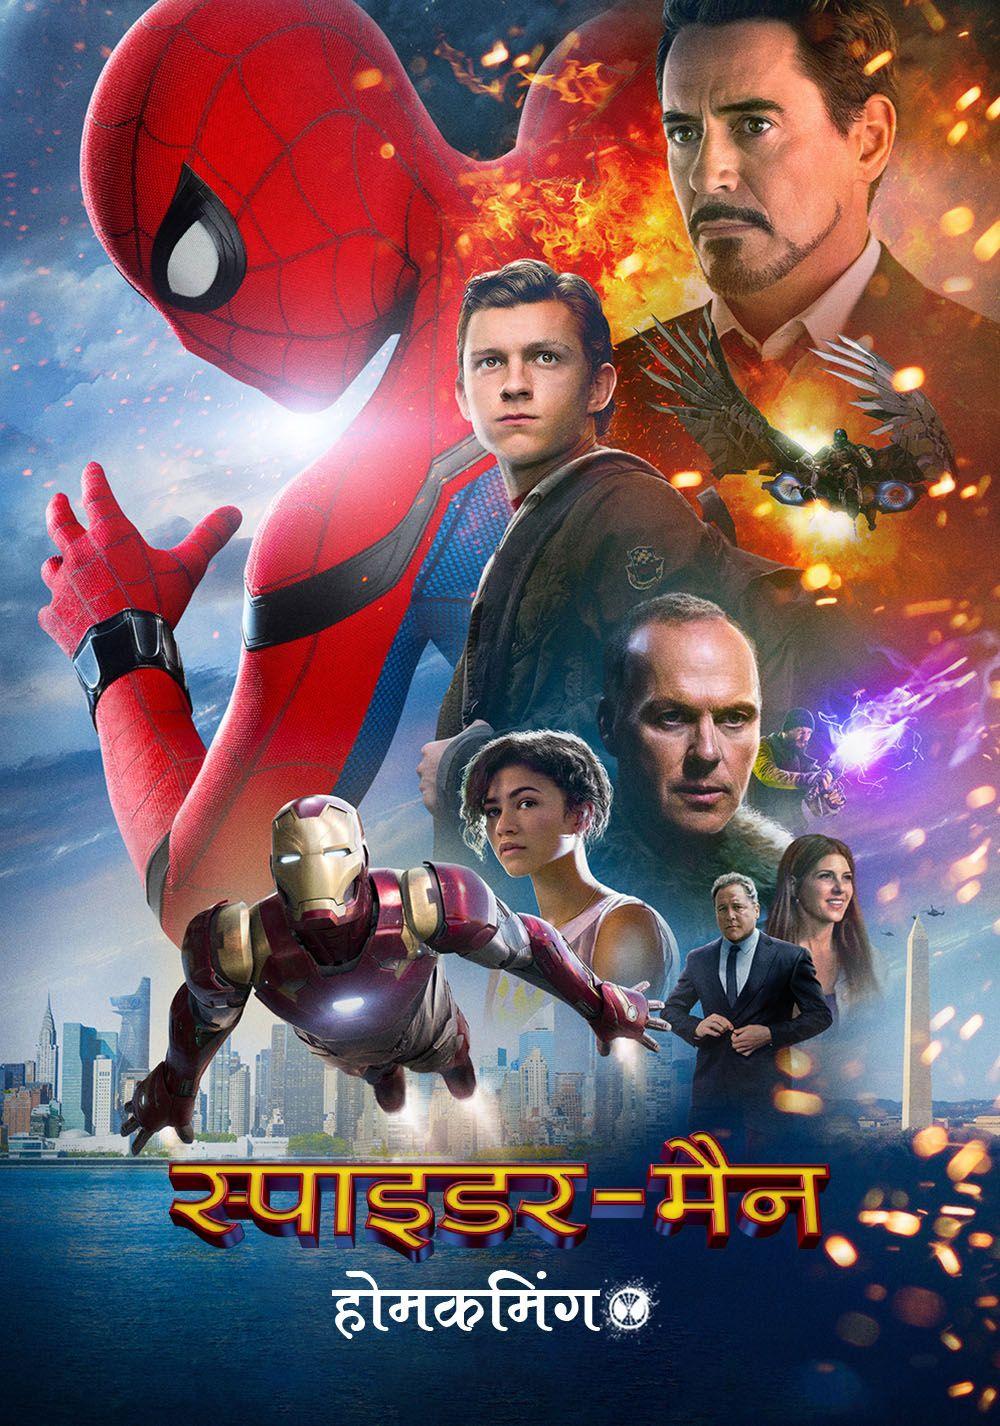 spider-man: homecoming 2017 hindi poster | spider-man | pinterest